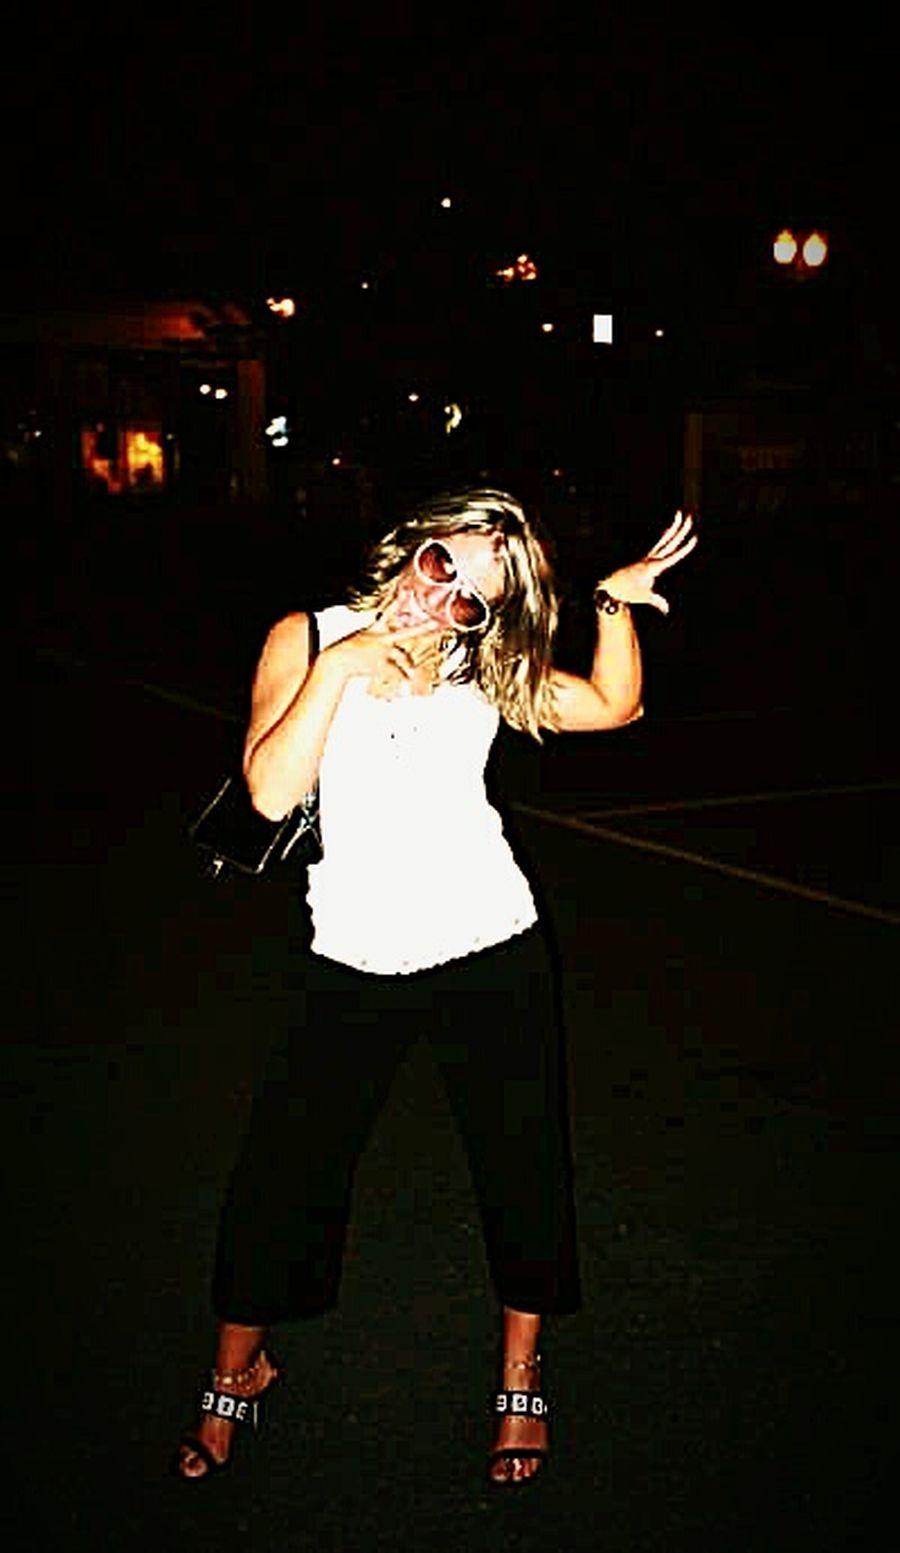 Striking Fashion It was a night to remember, the kind of night you never forget but why would you? Johnnyknoxville Alwayastory Mylipsaresealed Myworldyourjustinit EpicNight Thereisnoonelikeme💖 Youwishyouwereme Expression FavoriteShoes